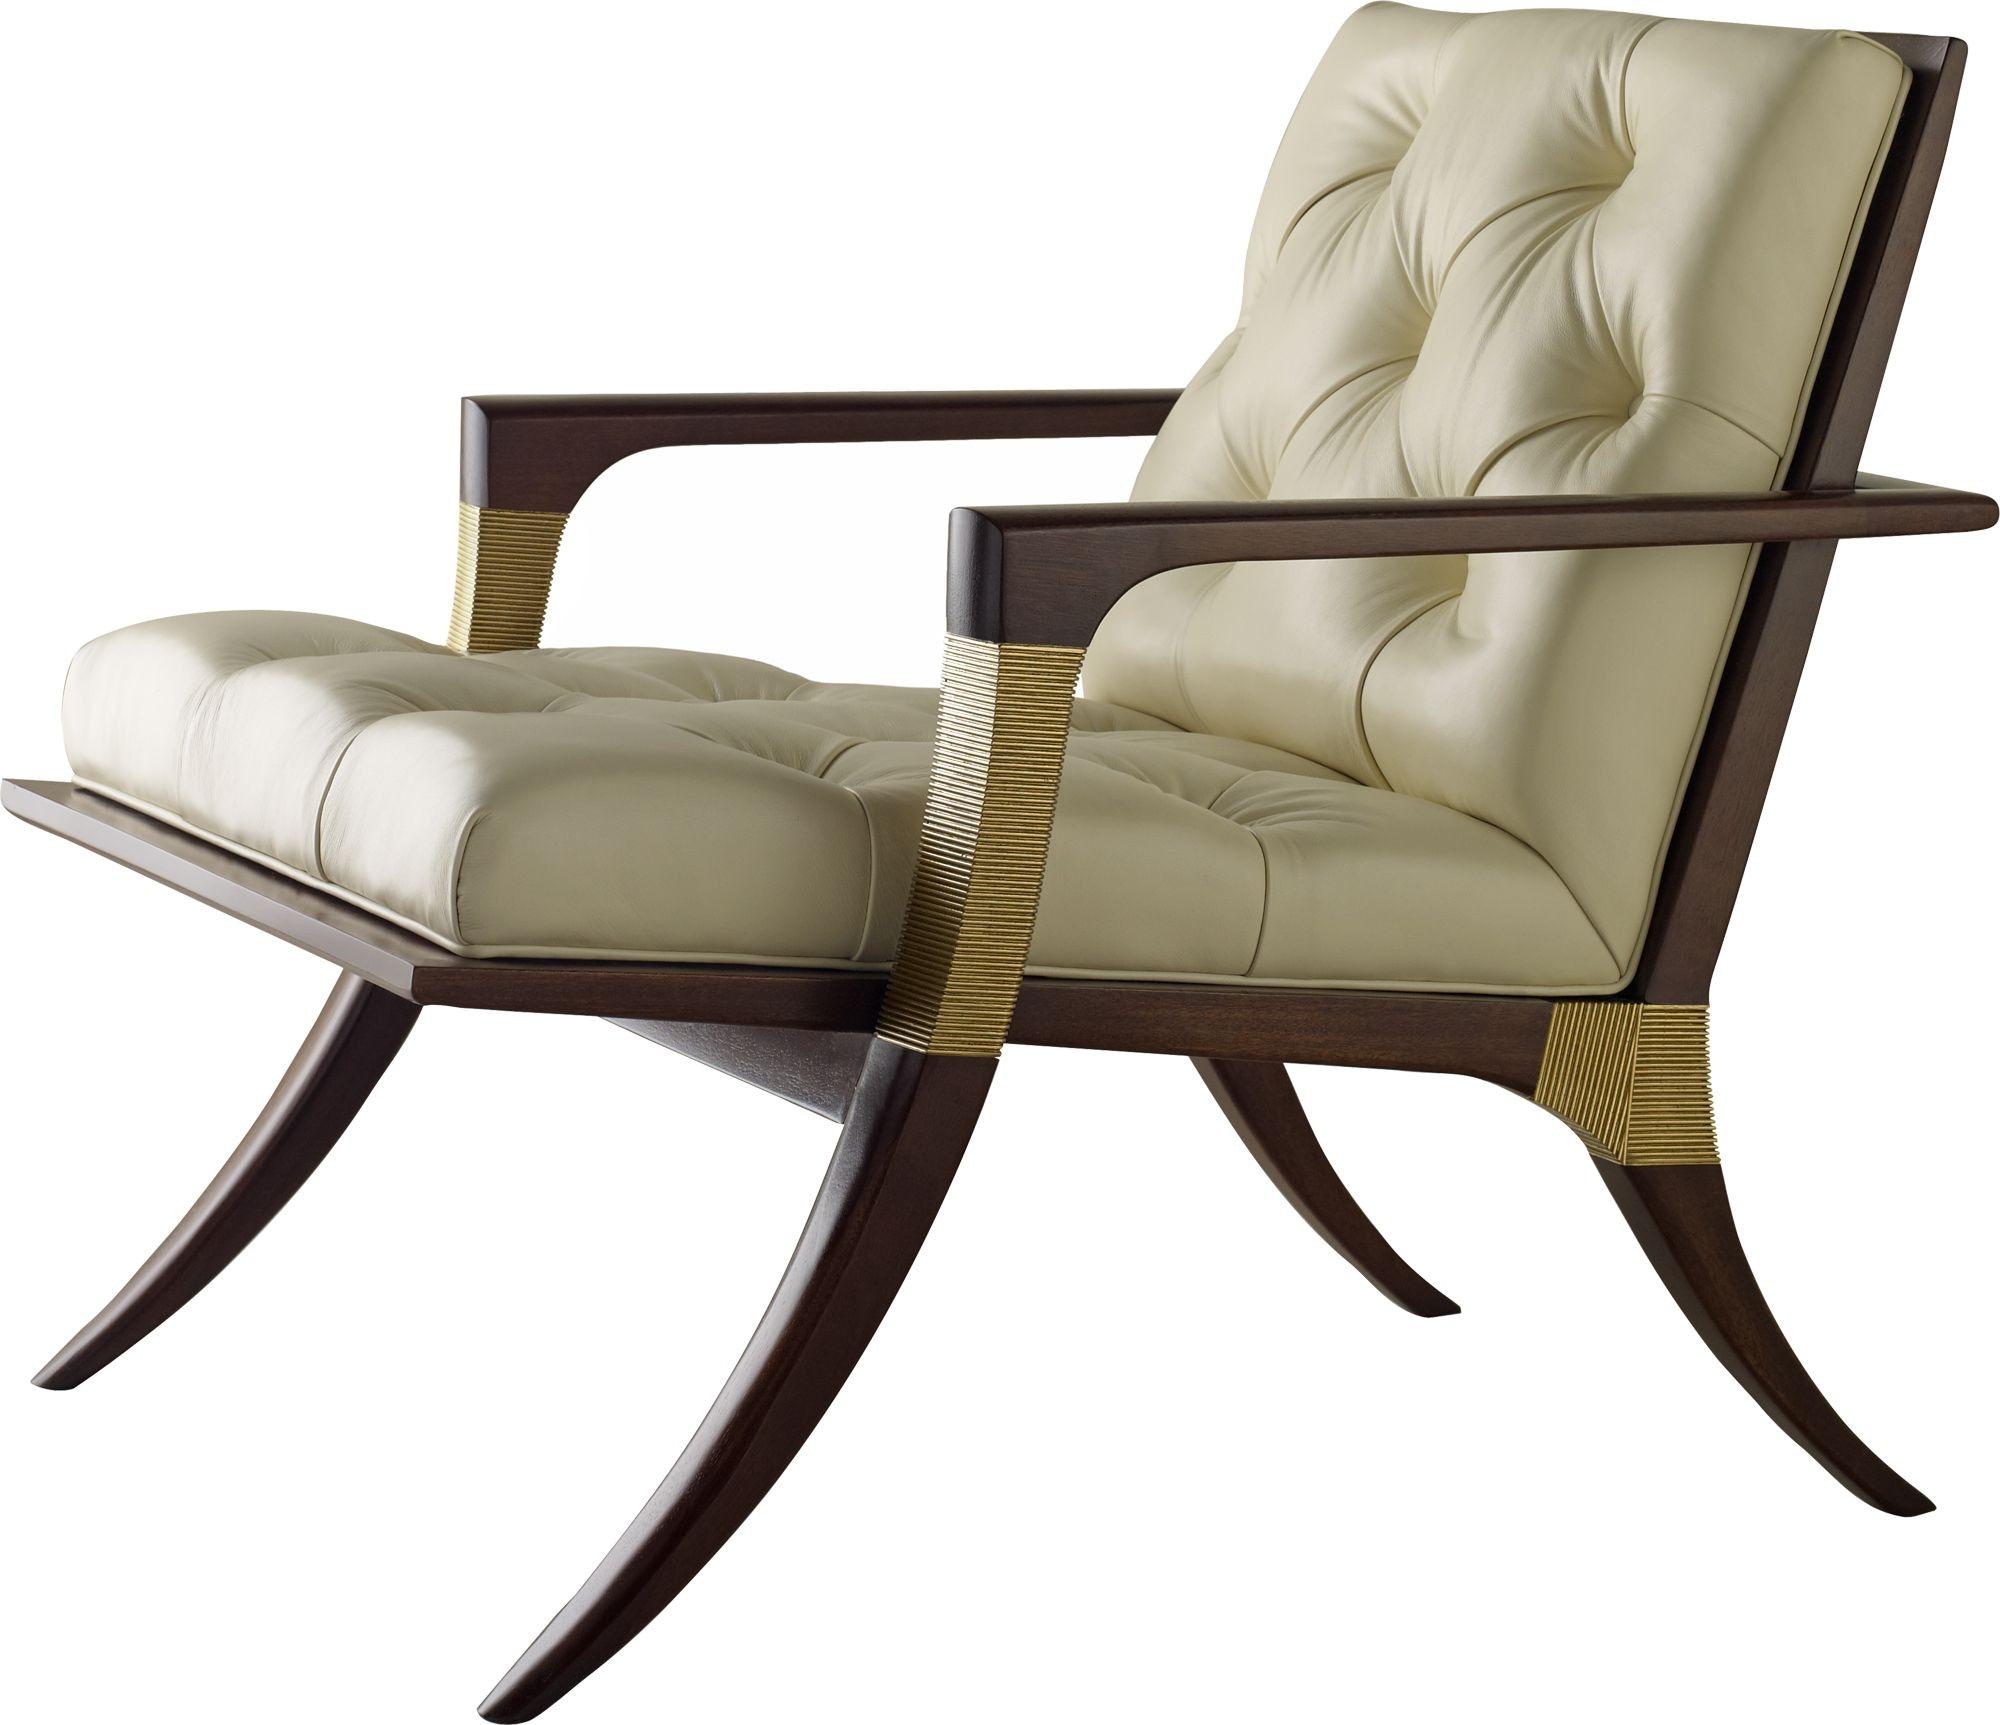 Baker Furniture Thomas Pheasant|Baker Designer Upholstery Athens Lounge  Chair   Tufted 6134C 1